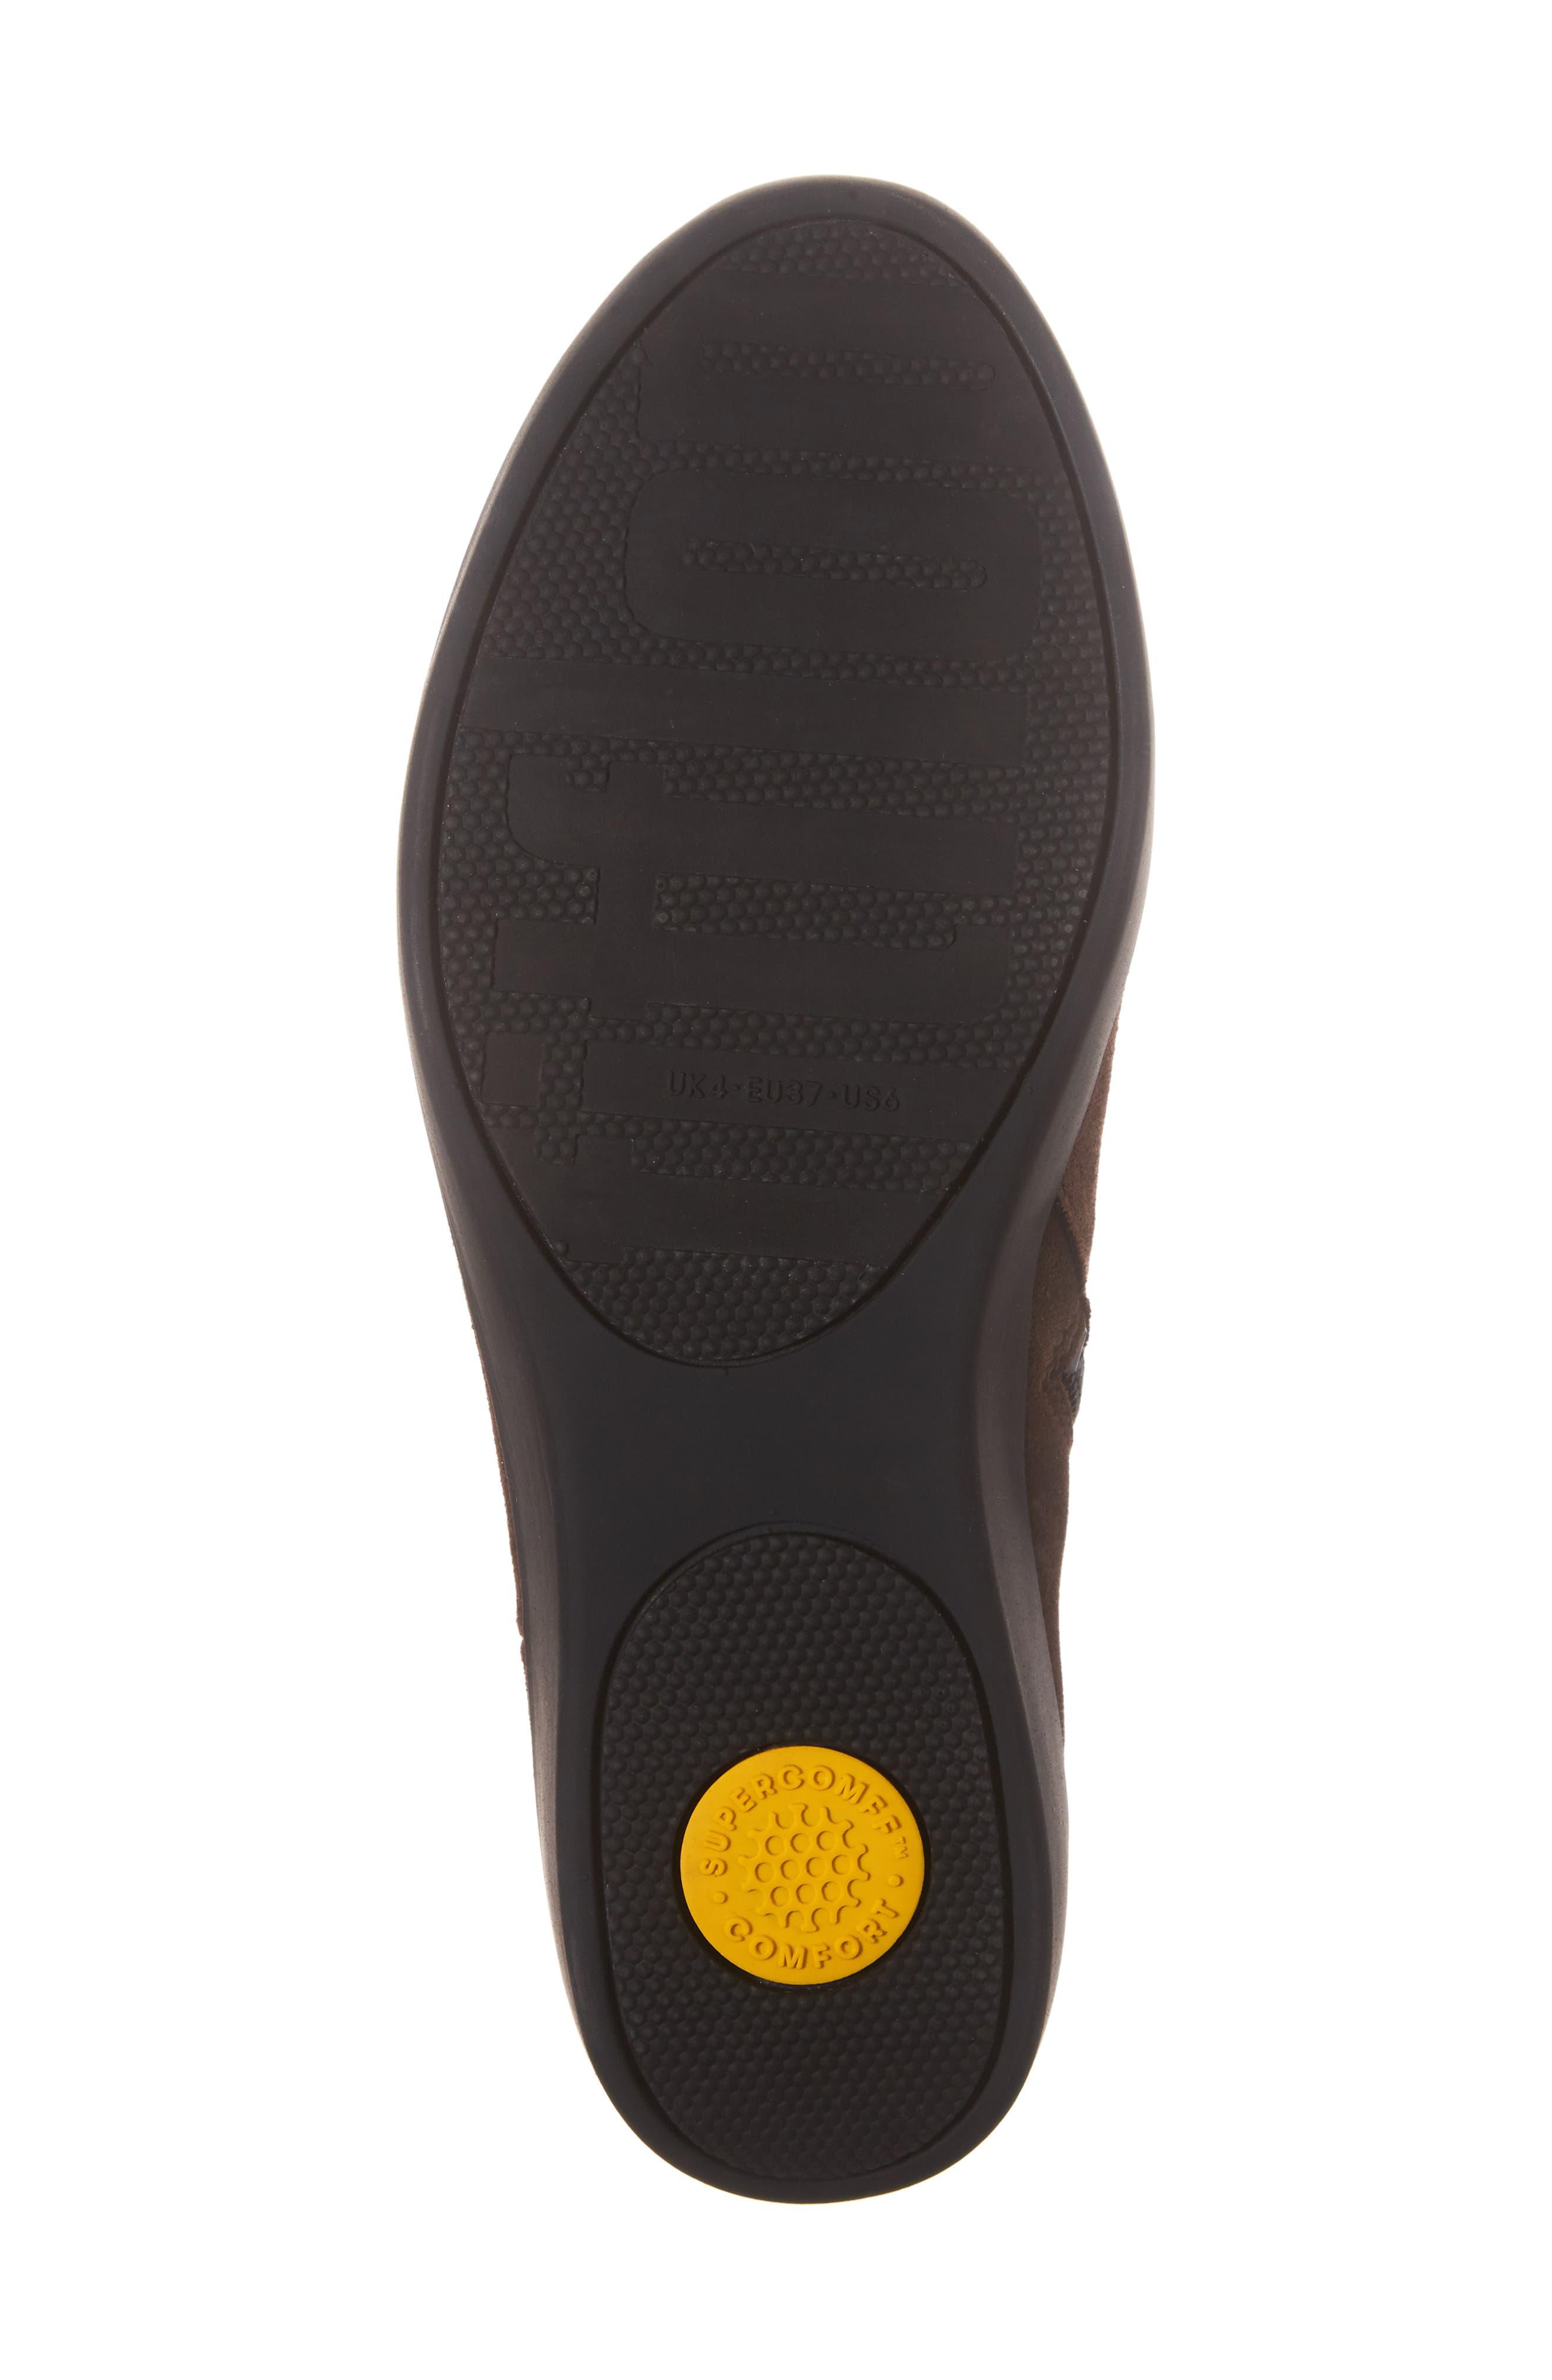 Supermod Ankle Boot,                             Alternate thumbnail 6, color,                             201